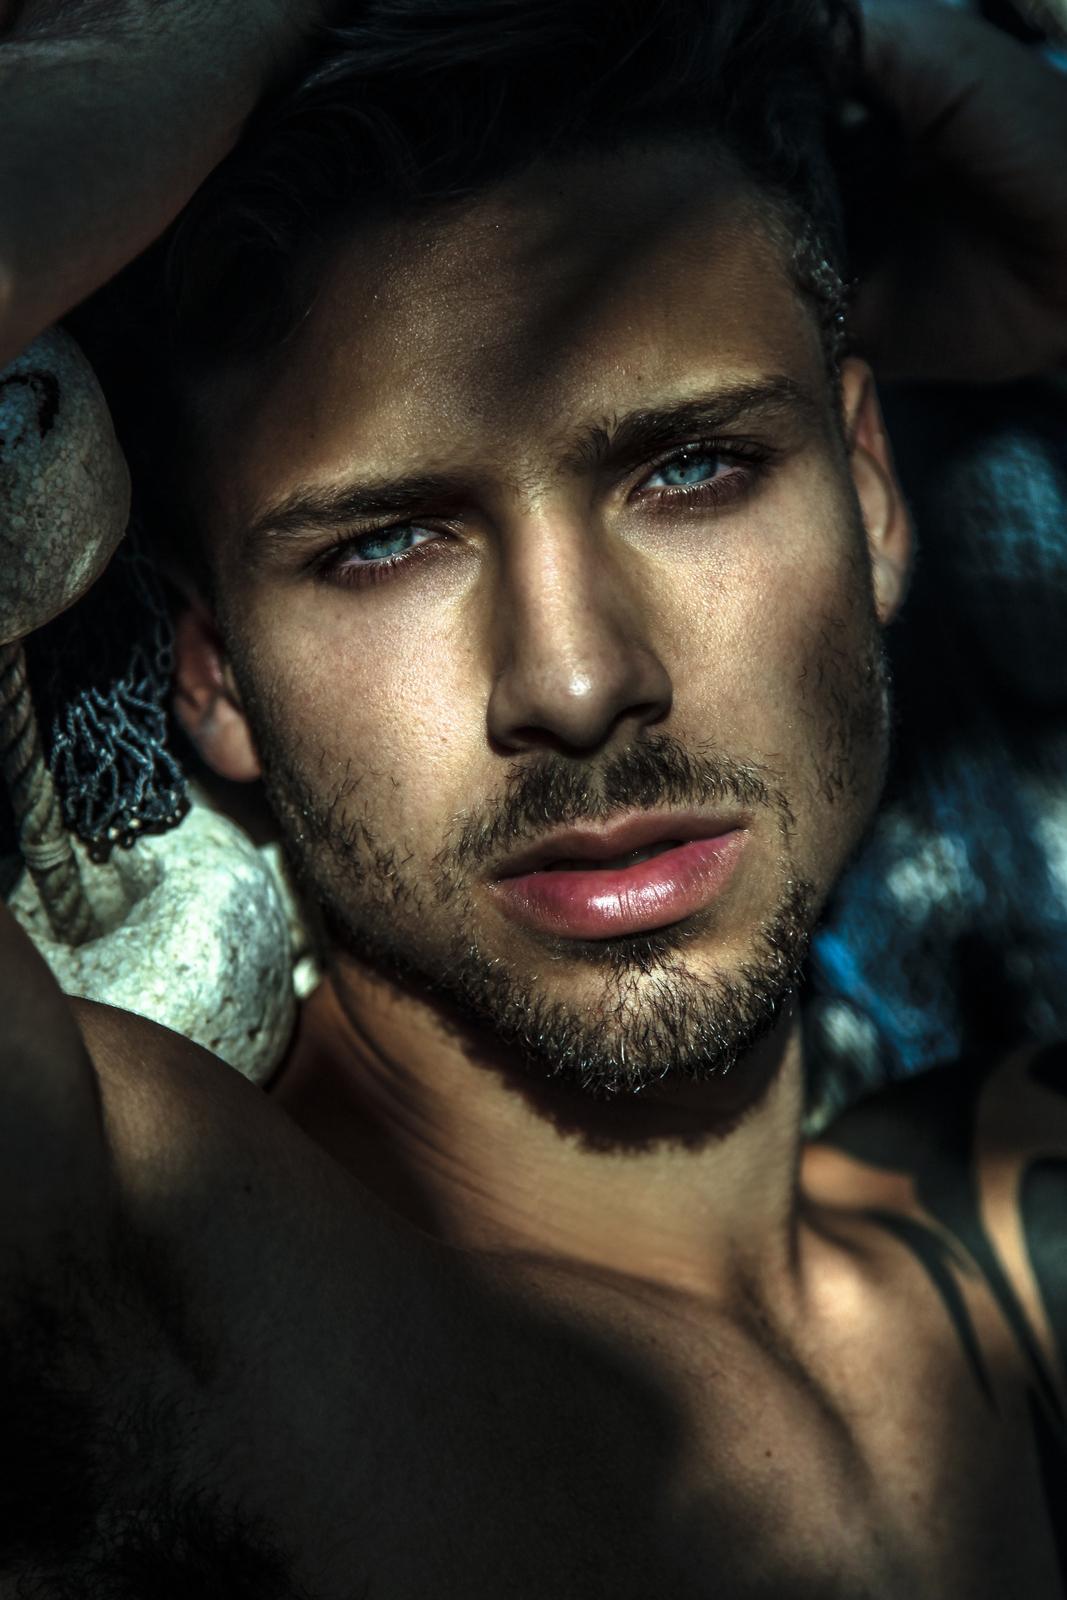 Lucas Hill by Fabio Pamplona